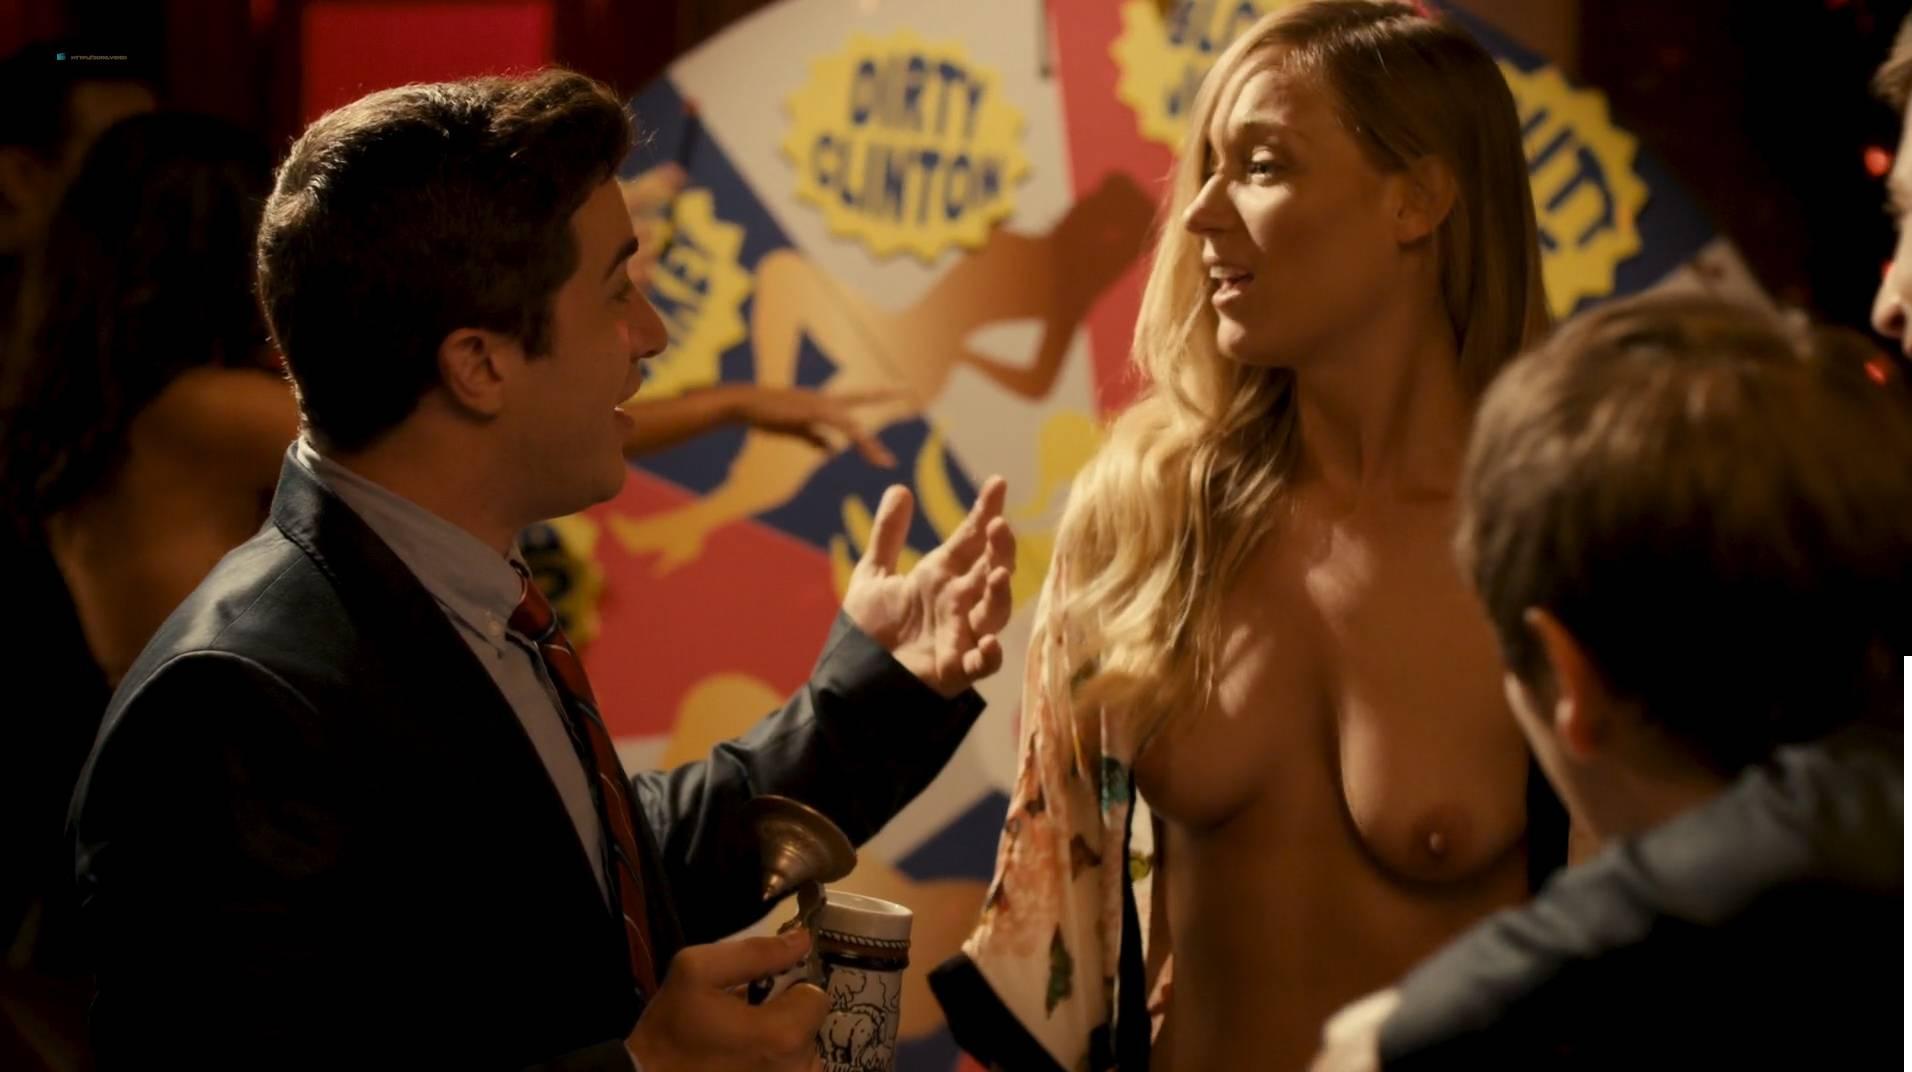 Jennifer Krukowski nude topless Aubrey Ferron and others all nude - Total Frat Movie (2016.) HD 1080p WEB (19)